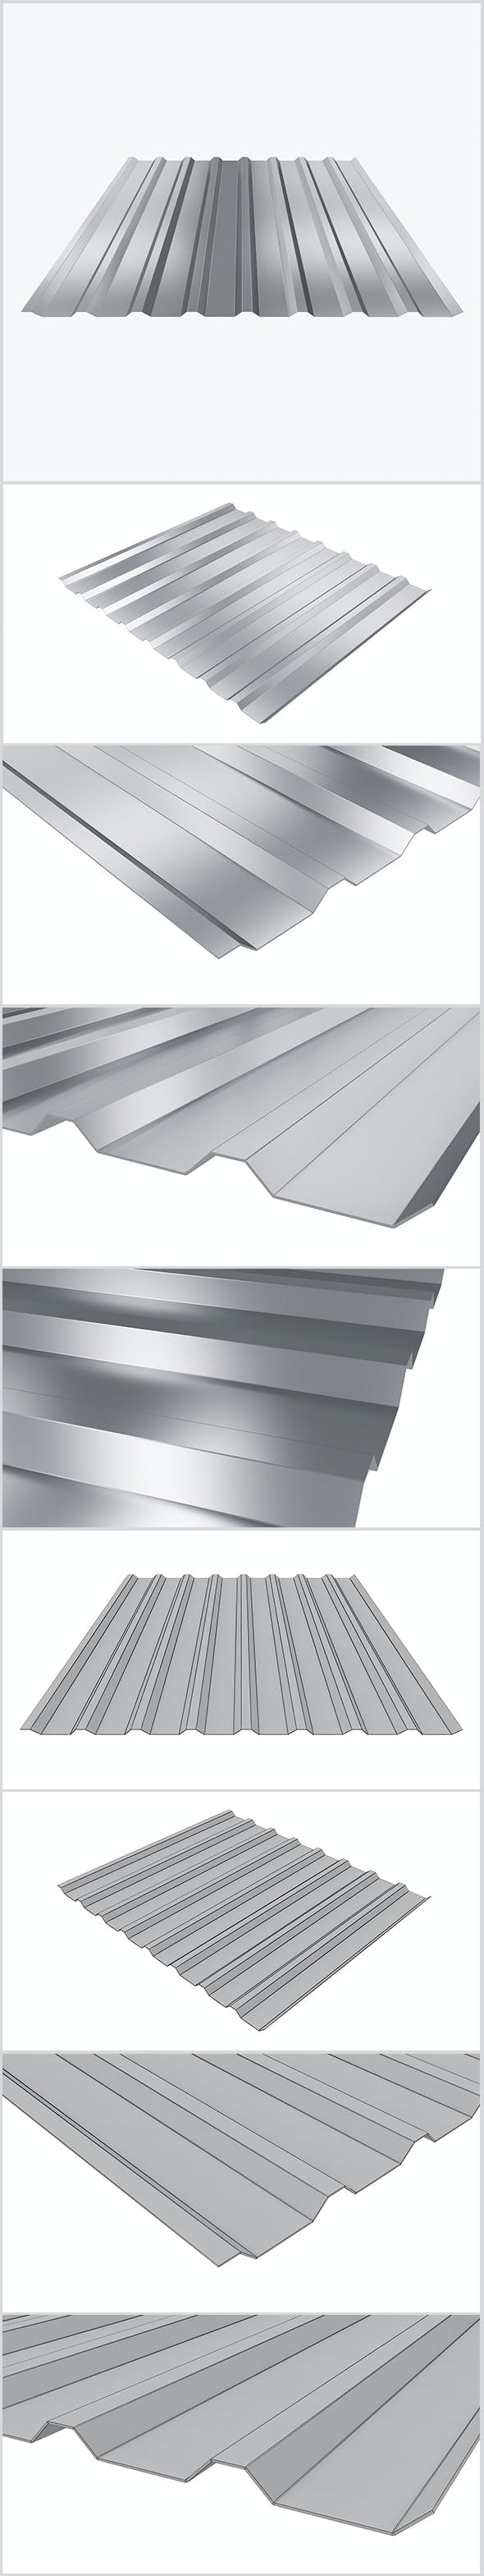 Profiled sheet 02 - 3DOcean Item for Sale